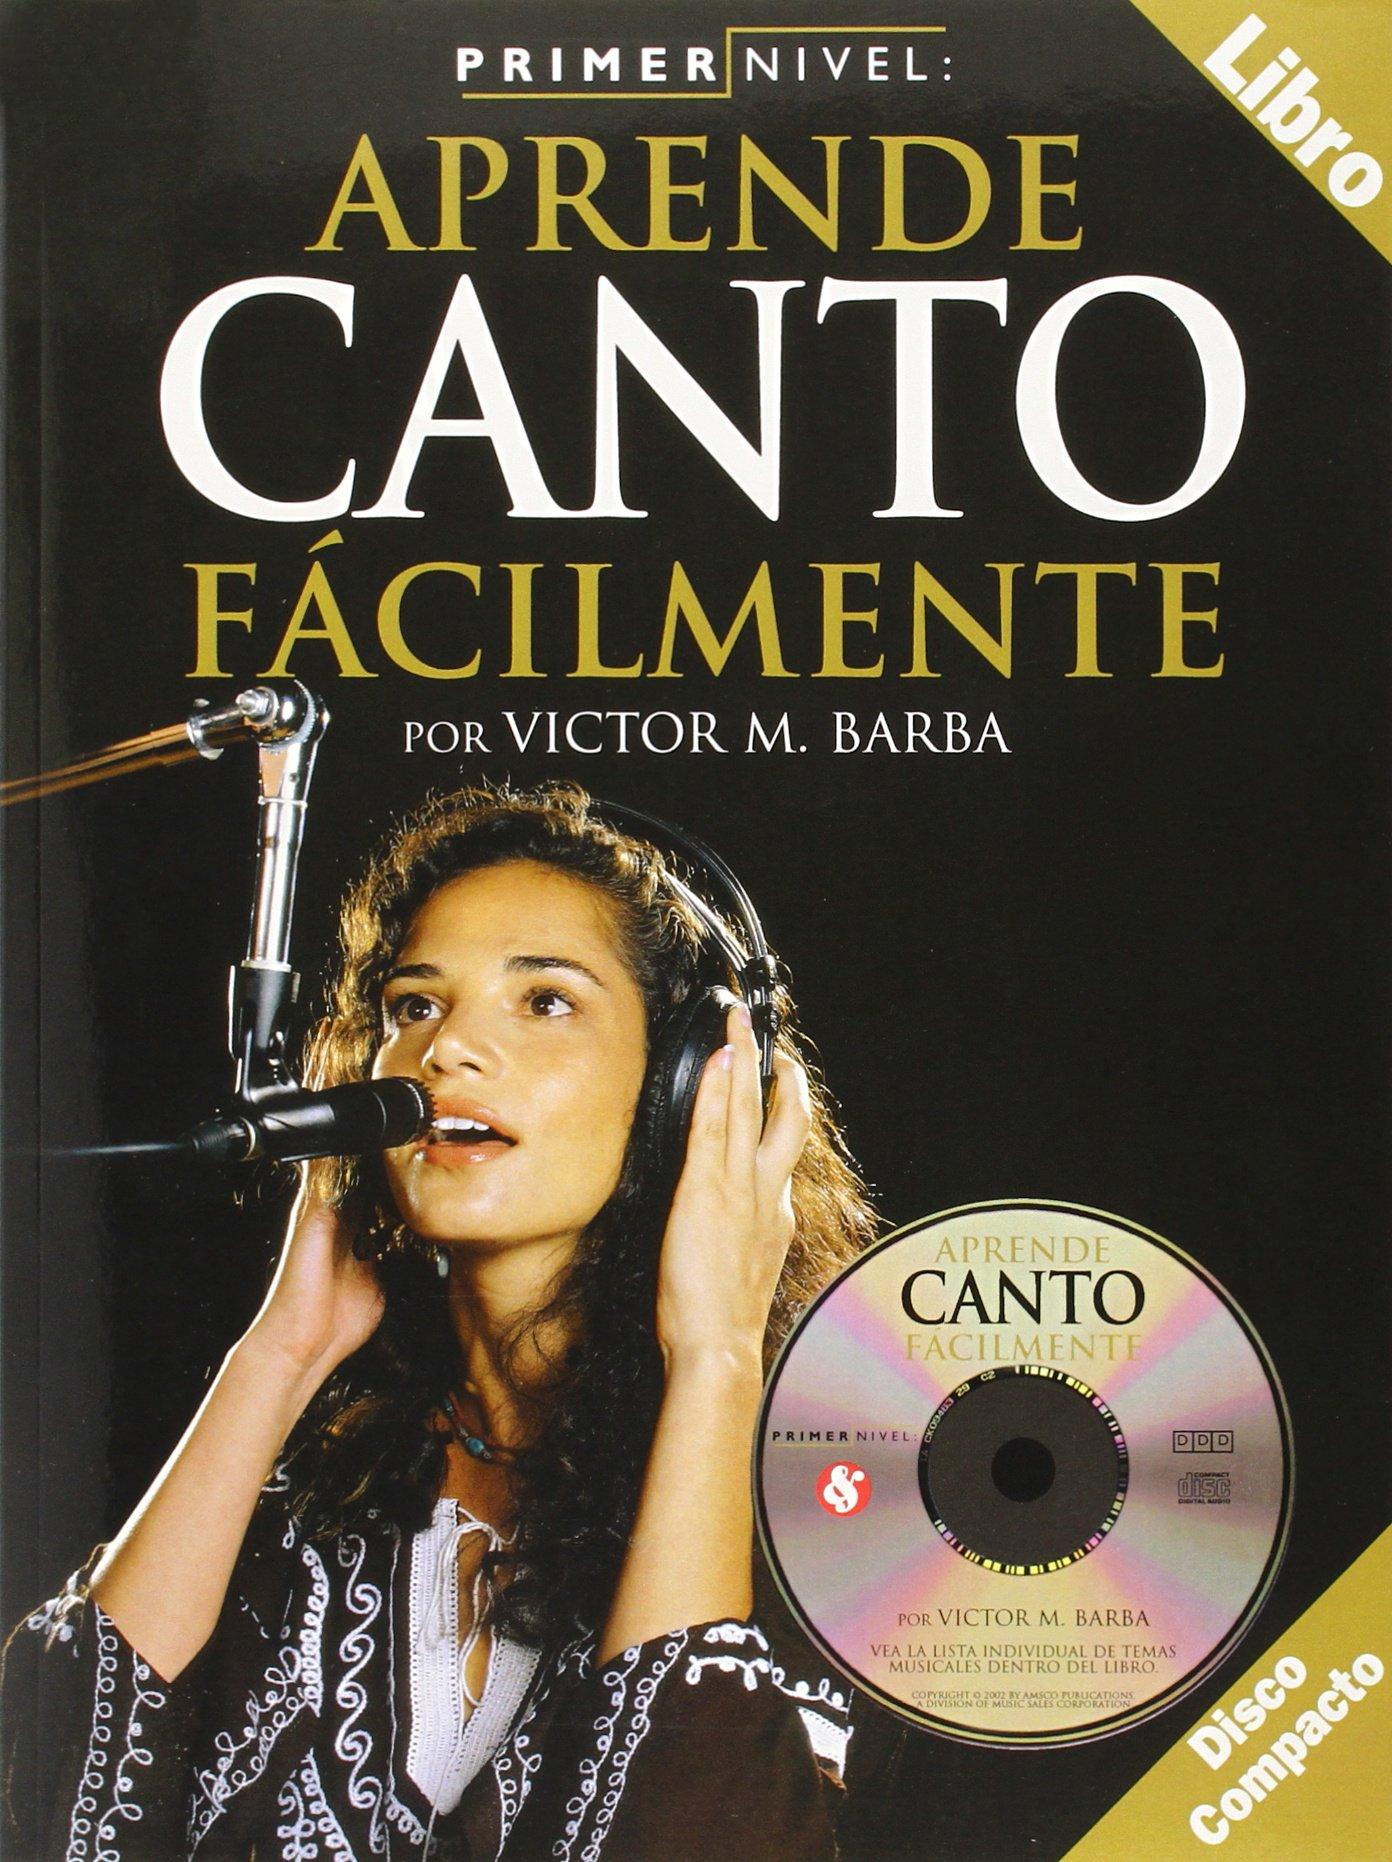 Primer Nivel: Aprende Canto Facilmente, Level 1: Chorus / Singing (Spanish Edition) ebook